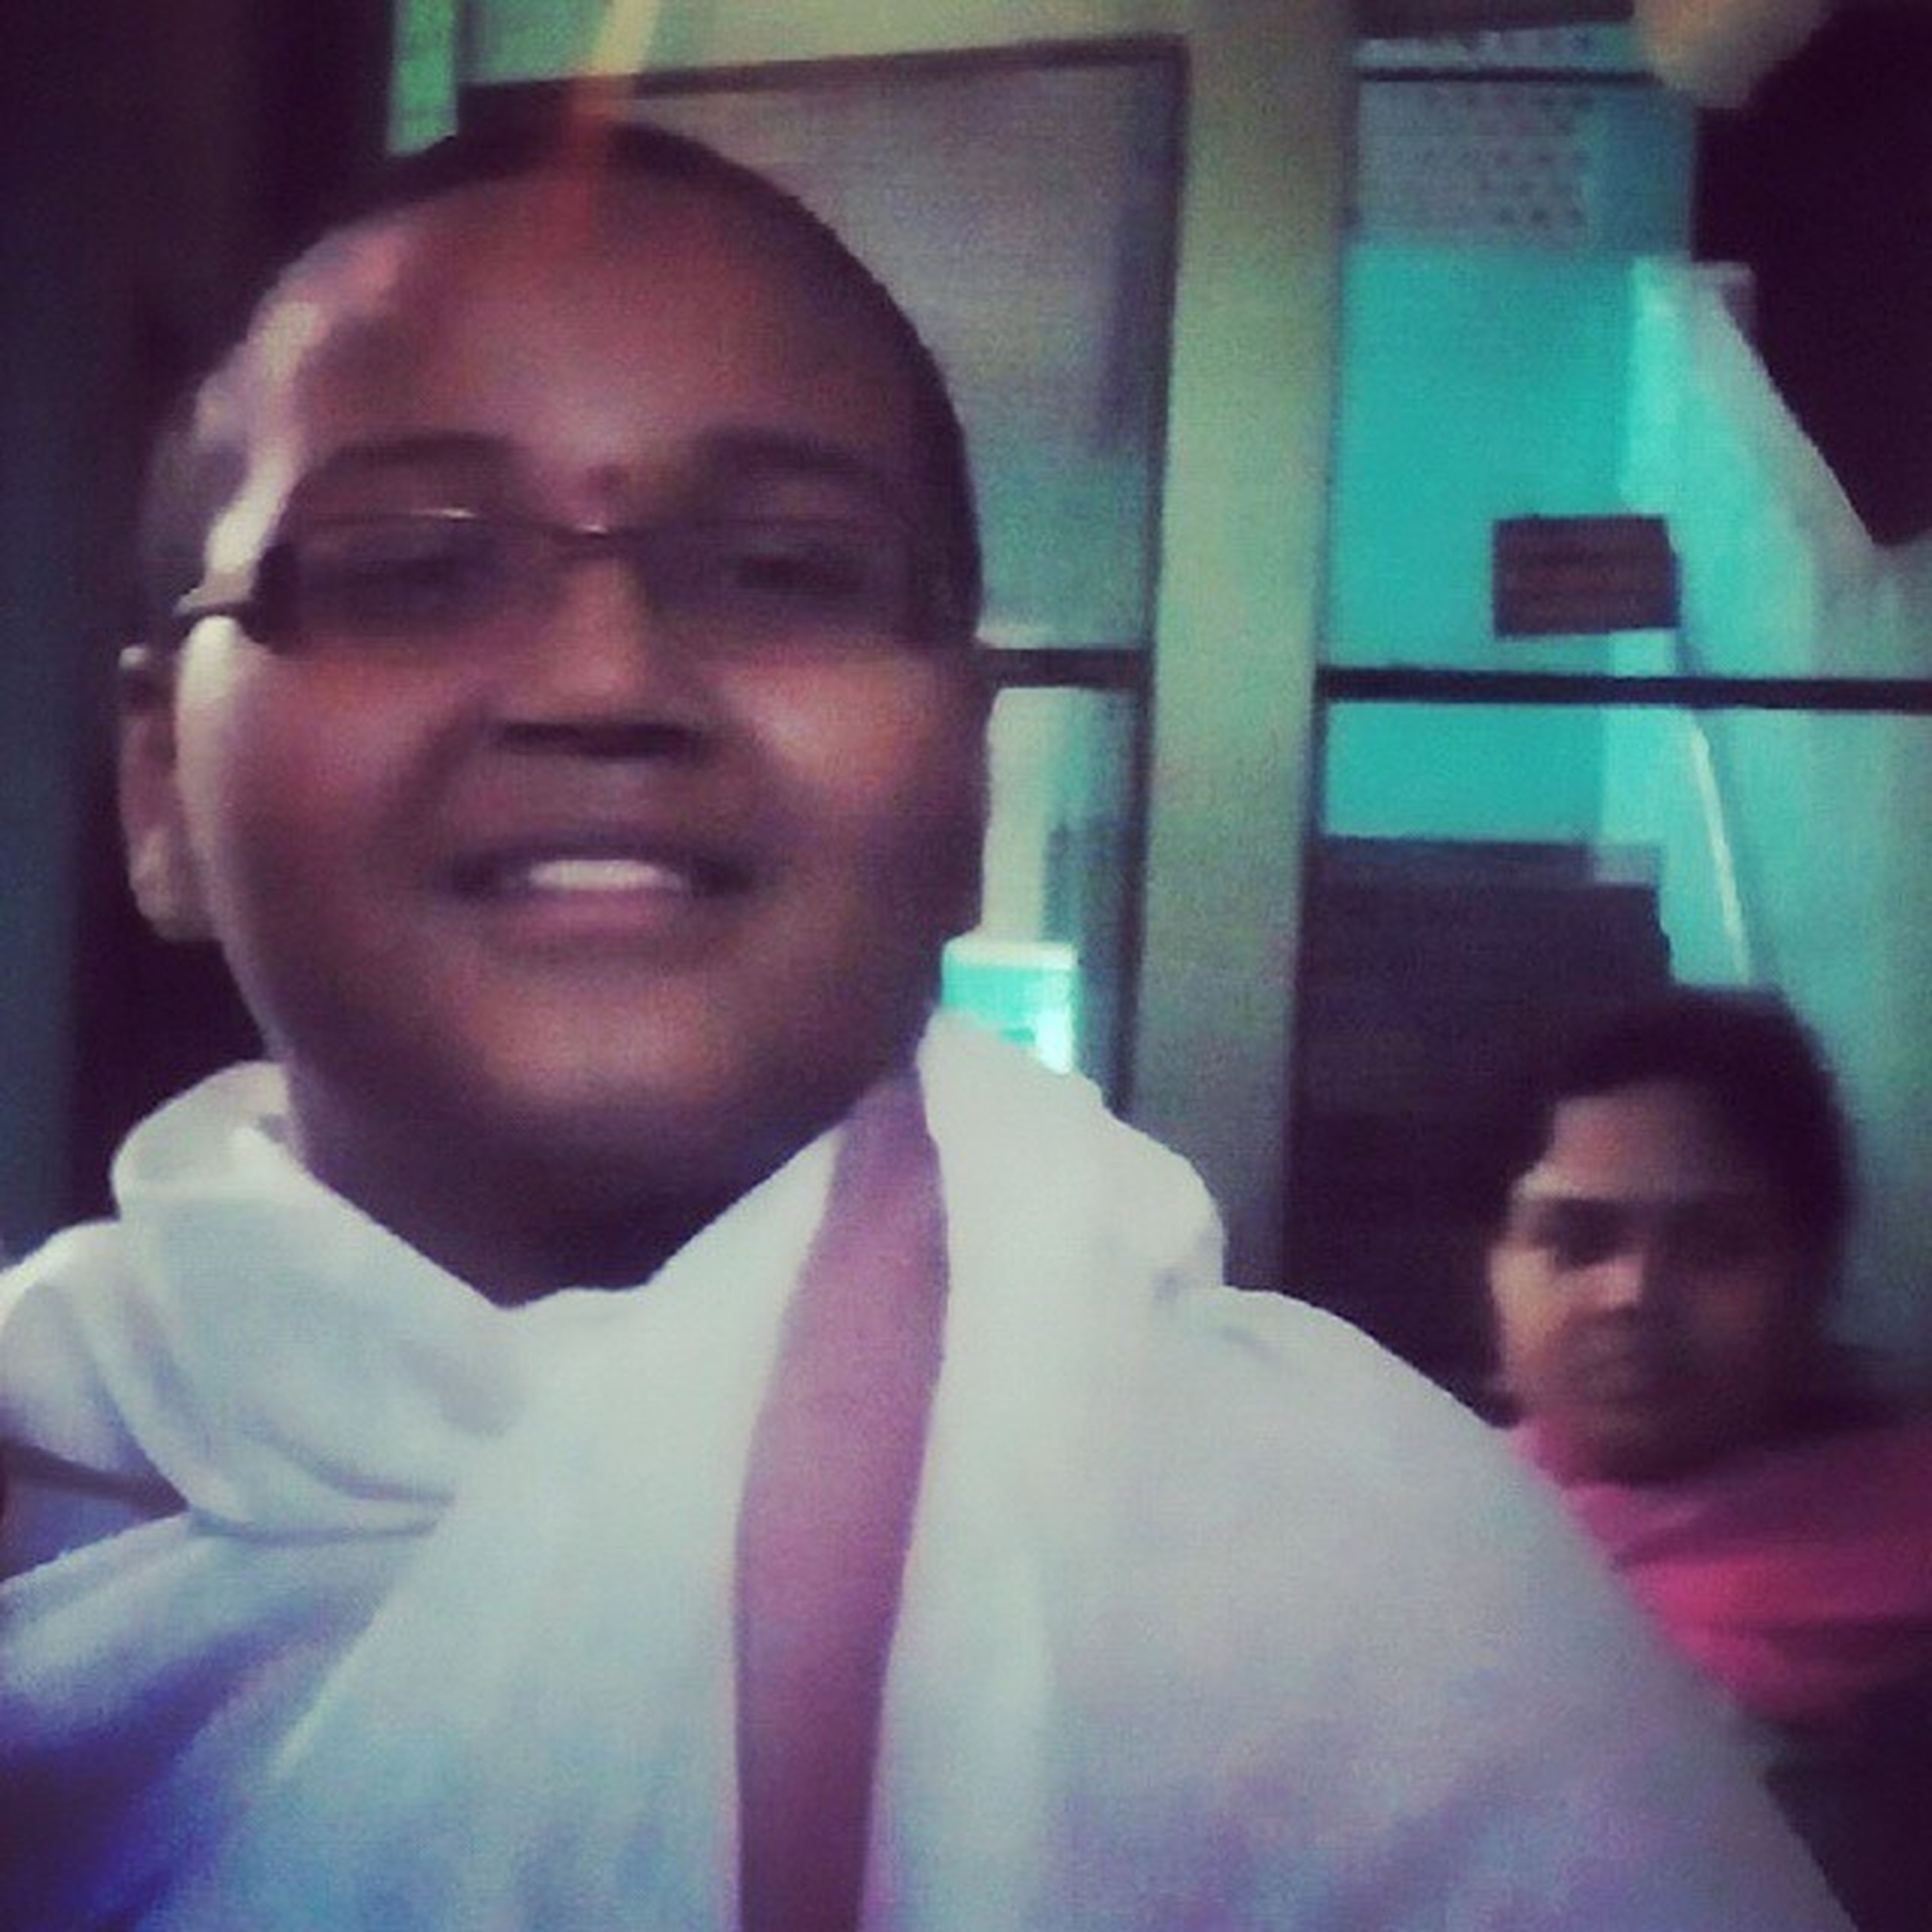 Sandhyavandanam classes at subhramanya samajam nallakunta.... :-) Sandhyavandanam Spiritual Workshop 12days Itslikegurukulam Newatmoshere Lovely Newfriends 1stday Awaitingnewexperience Practise Learning Muchmore ..... :-)Fotogeek15